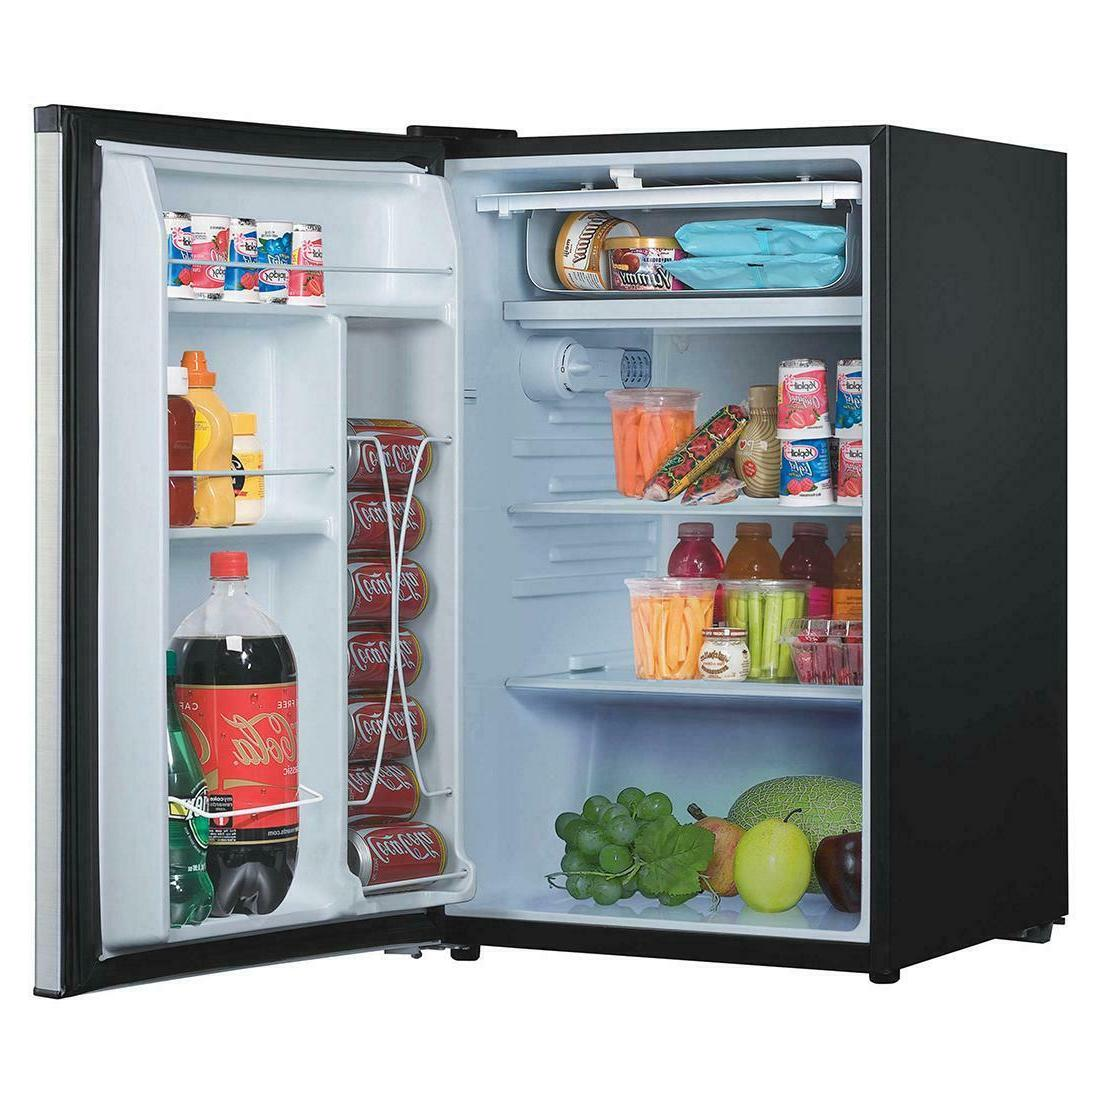 Whirlpool 4.3 Compact Mini Refrigerator